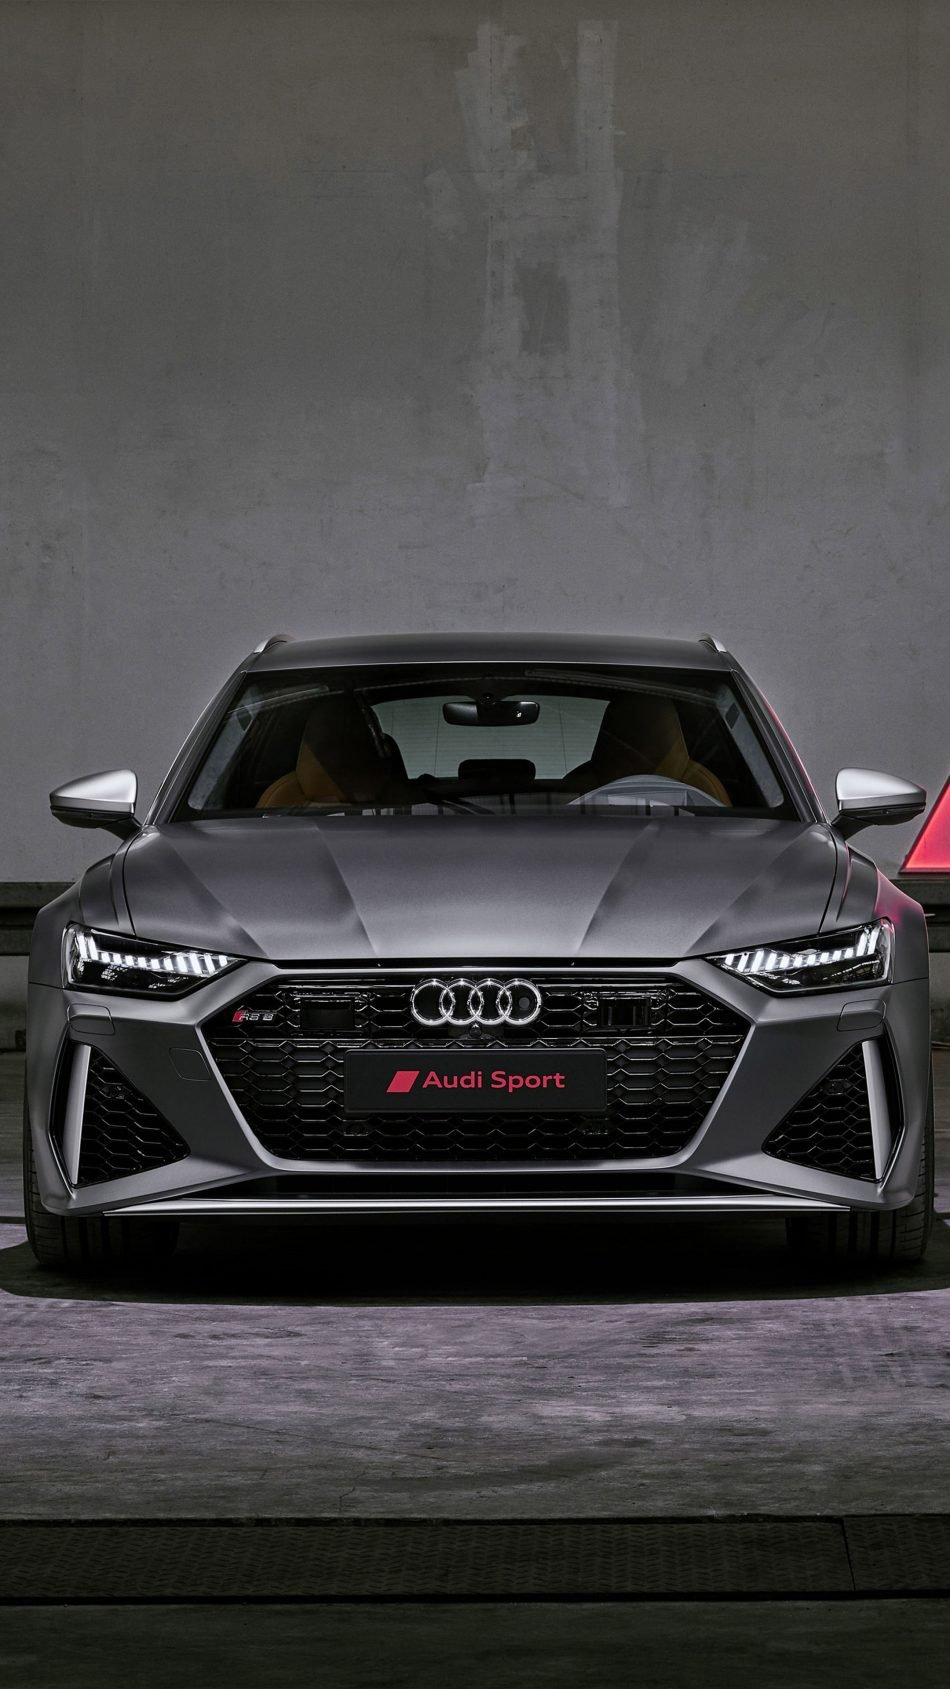 Audi Rs6 Avant 2020 4k Ultra Hd Mobile Wallpaper   New Audi Rs6 950x1689